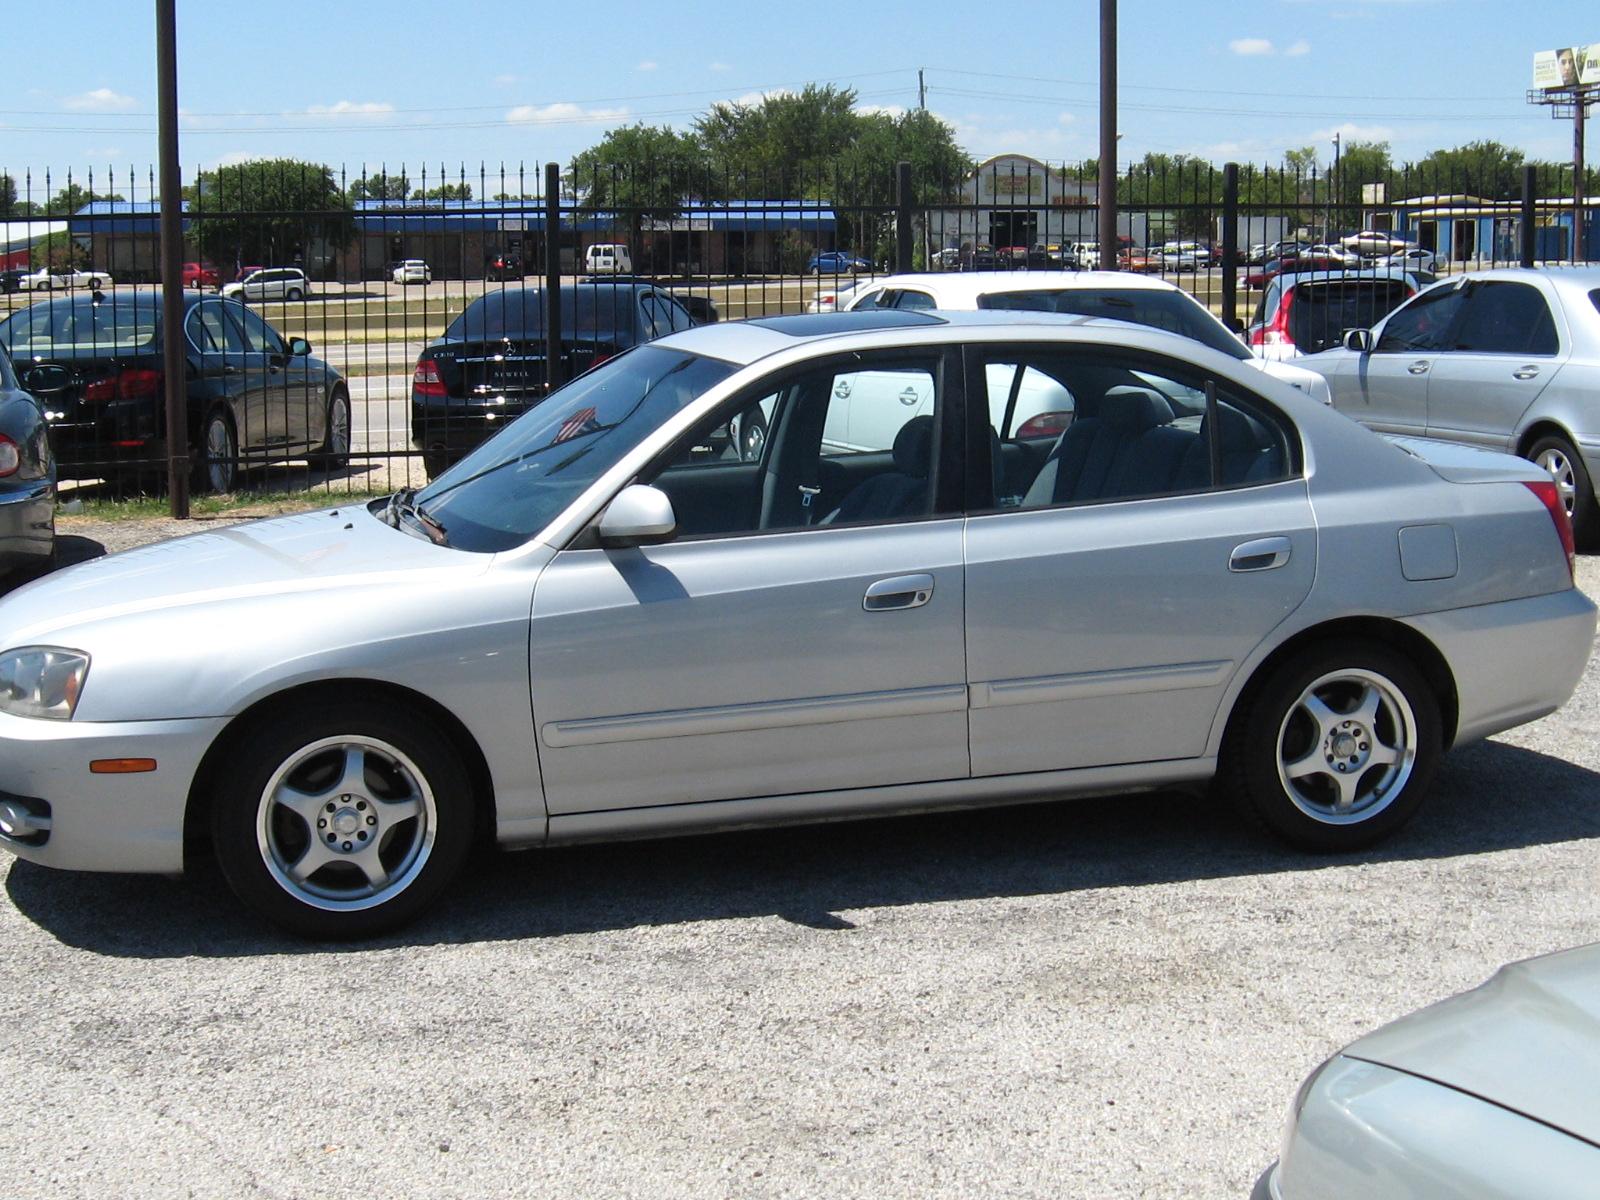 Hyundai Elantra Gas Mileage >> 2006 Hyundai Elantra GLS | Welcome to Autoworldtx